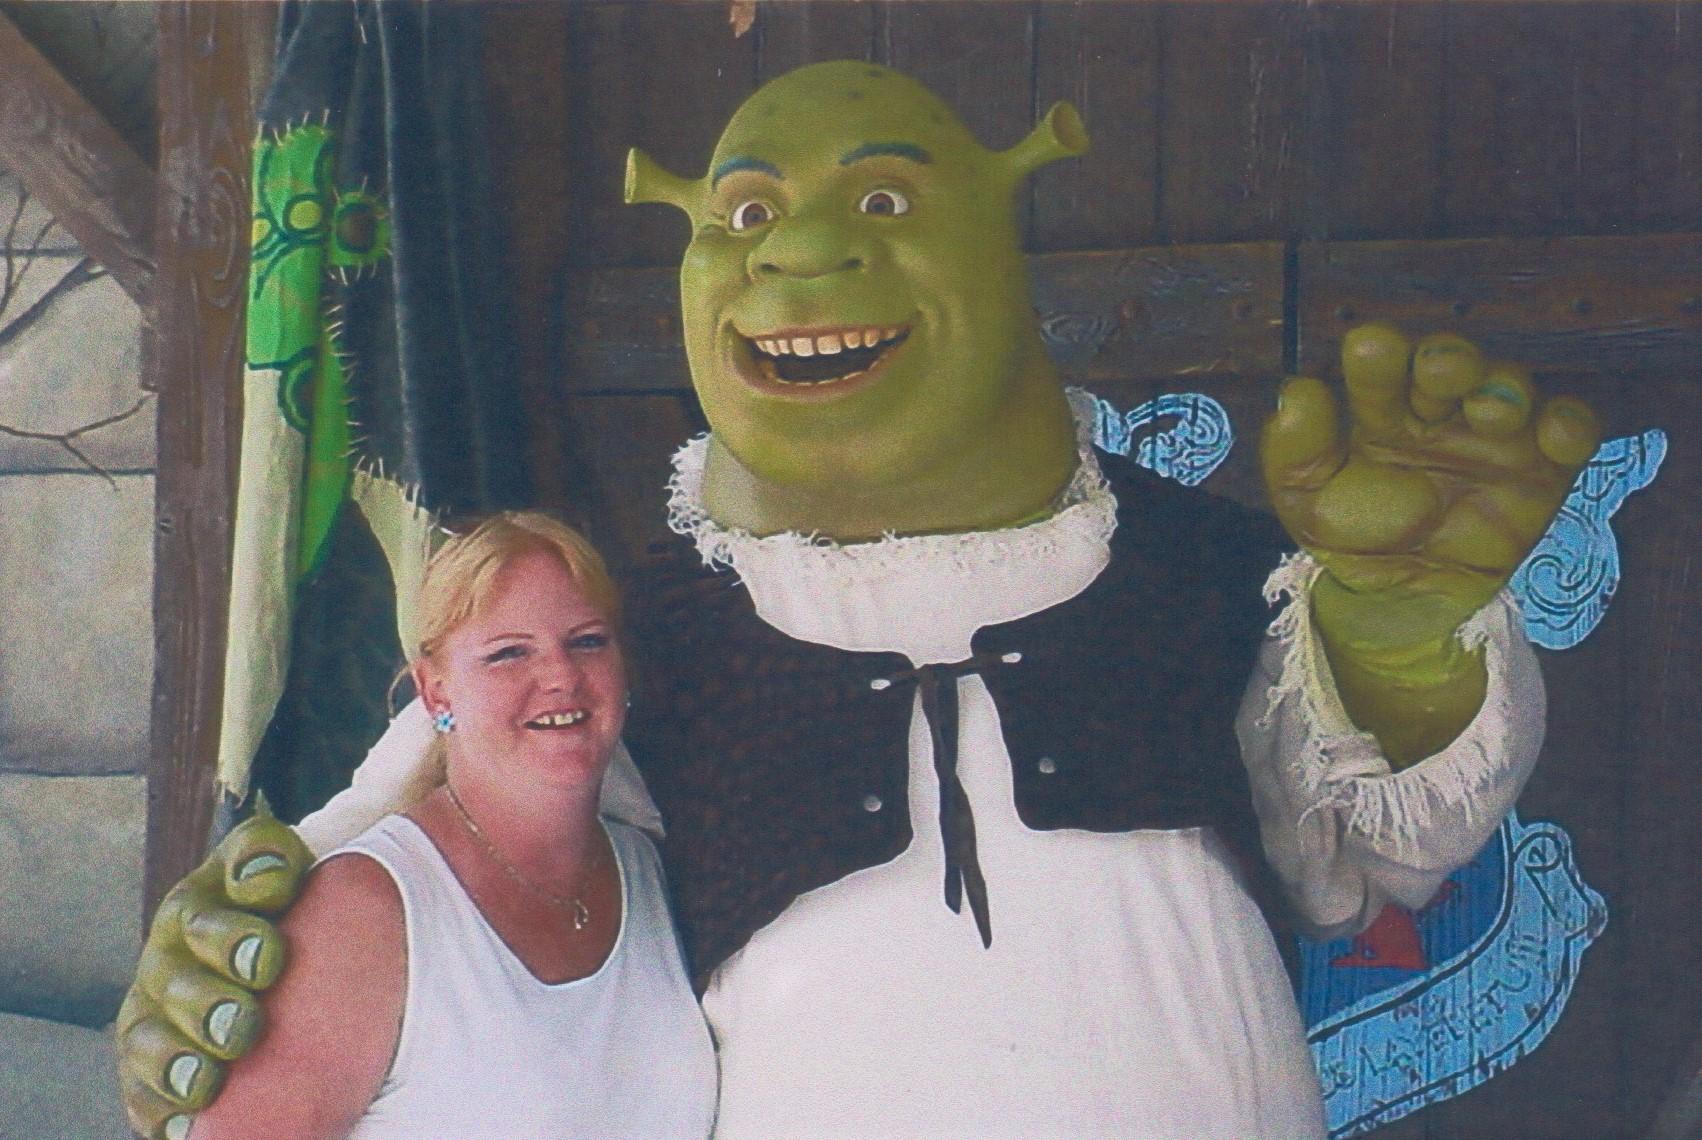 With Shrek!